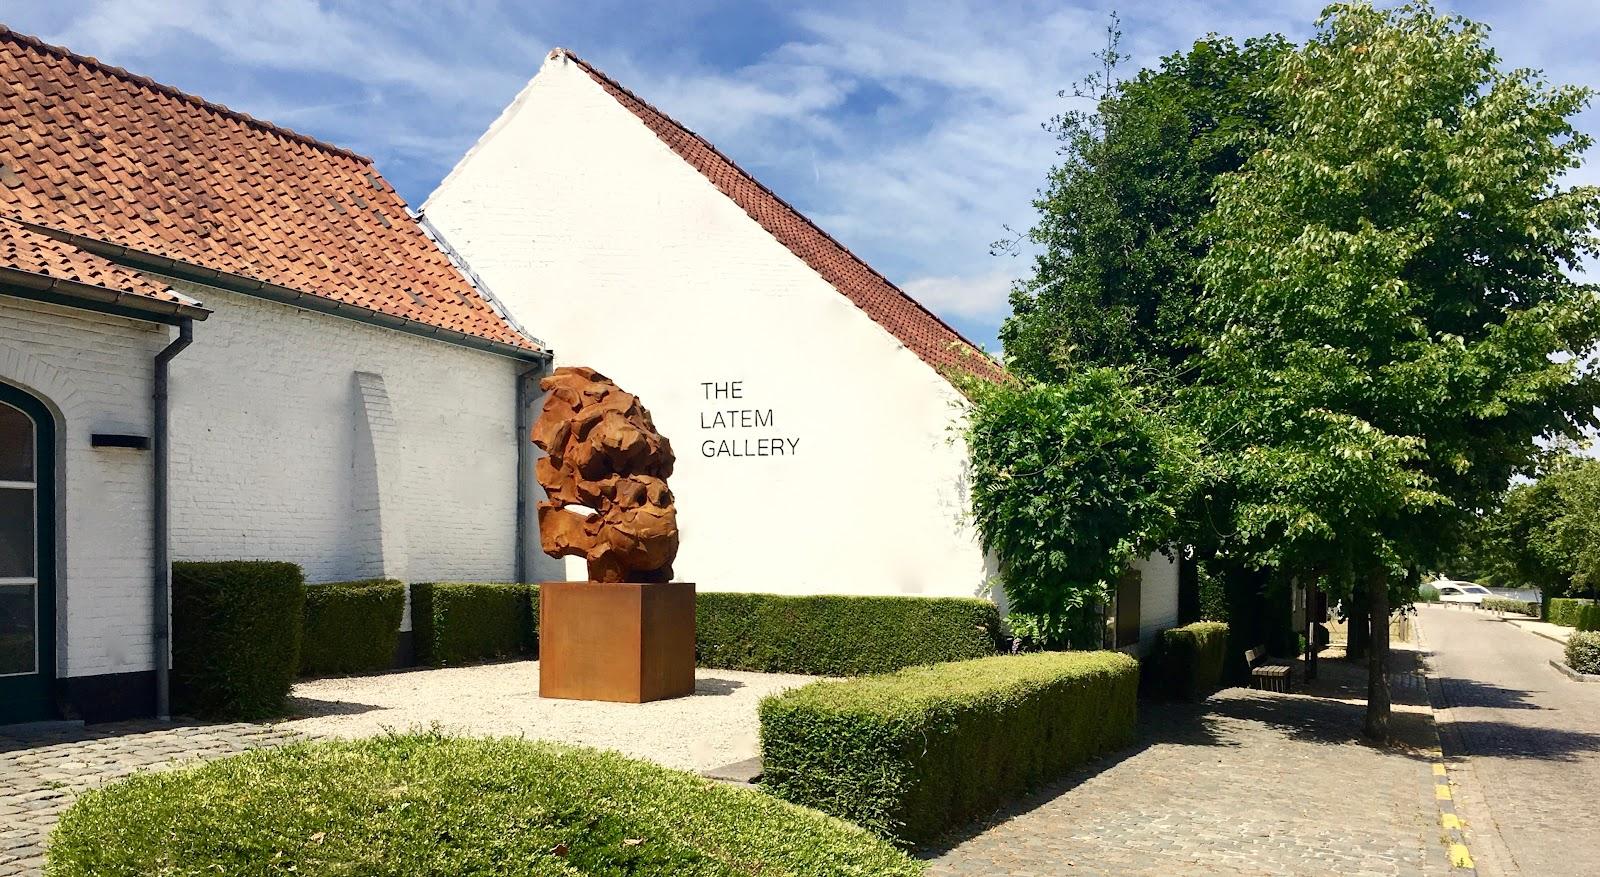 "catherine thiry sculpture wanted gorilla ""ààcm contemporarysculptor belgianartist belgium art brussels .jpg"